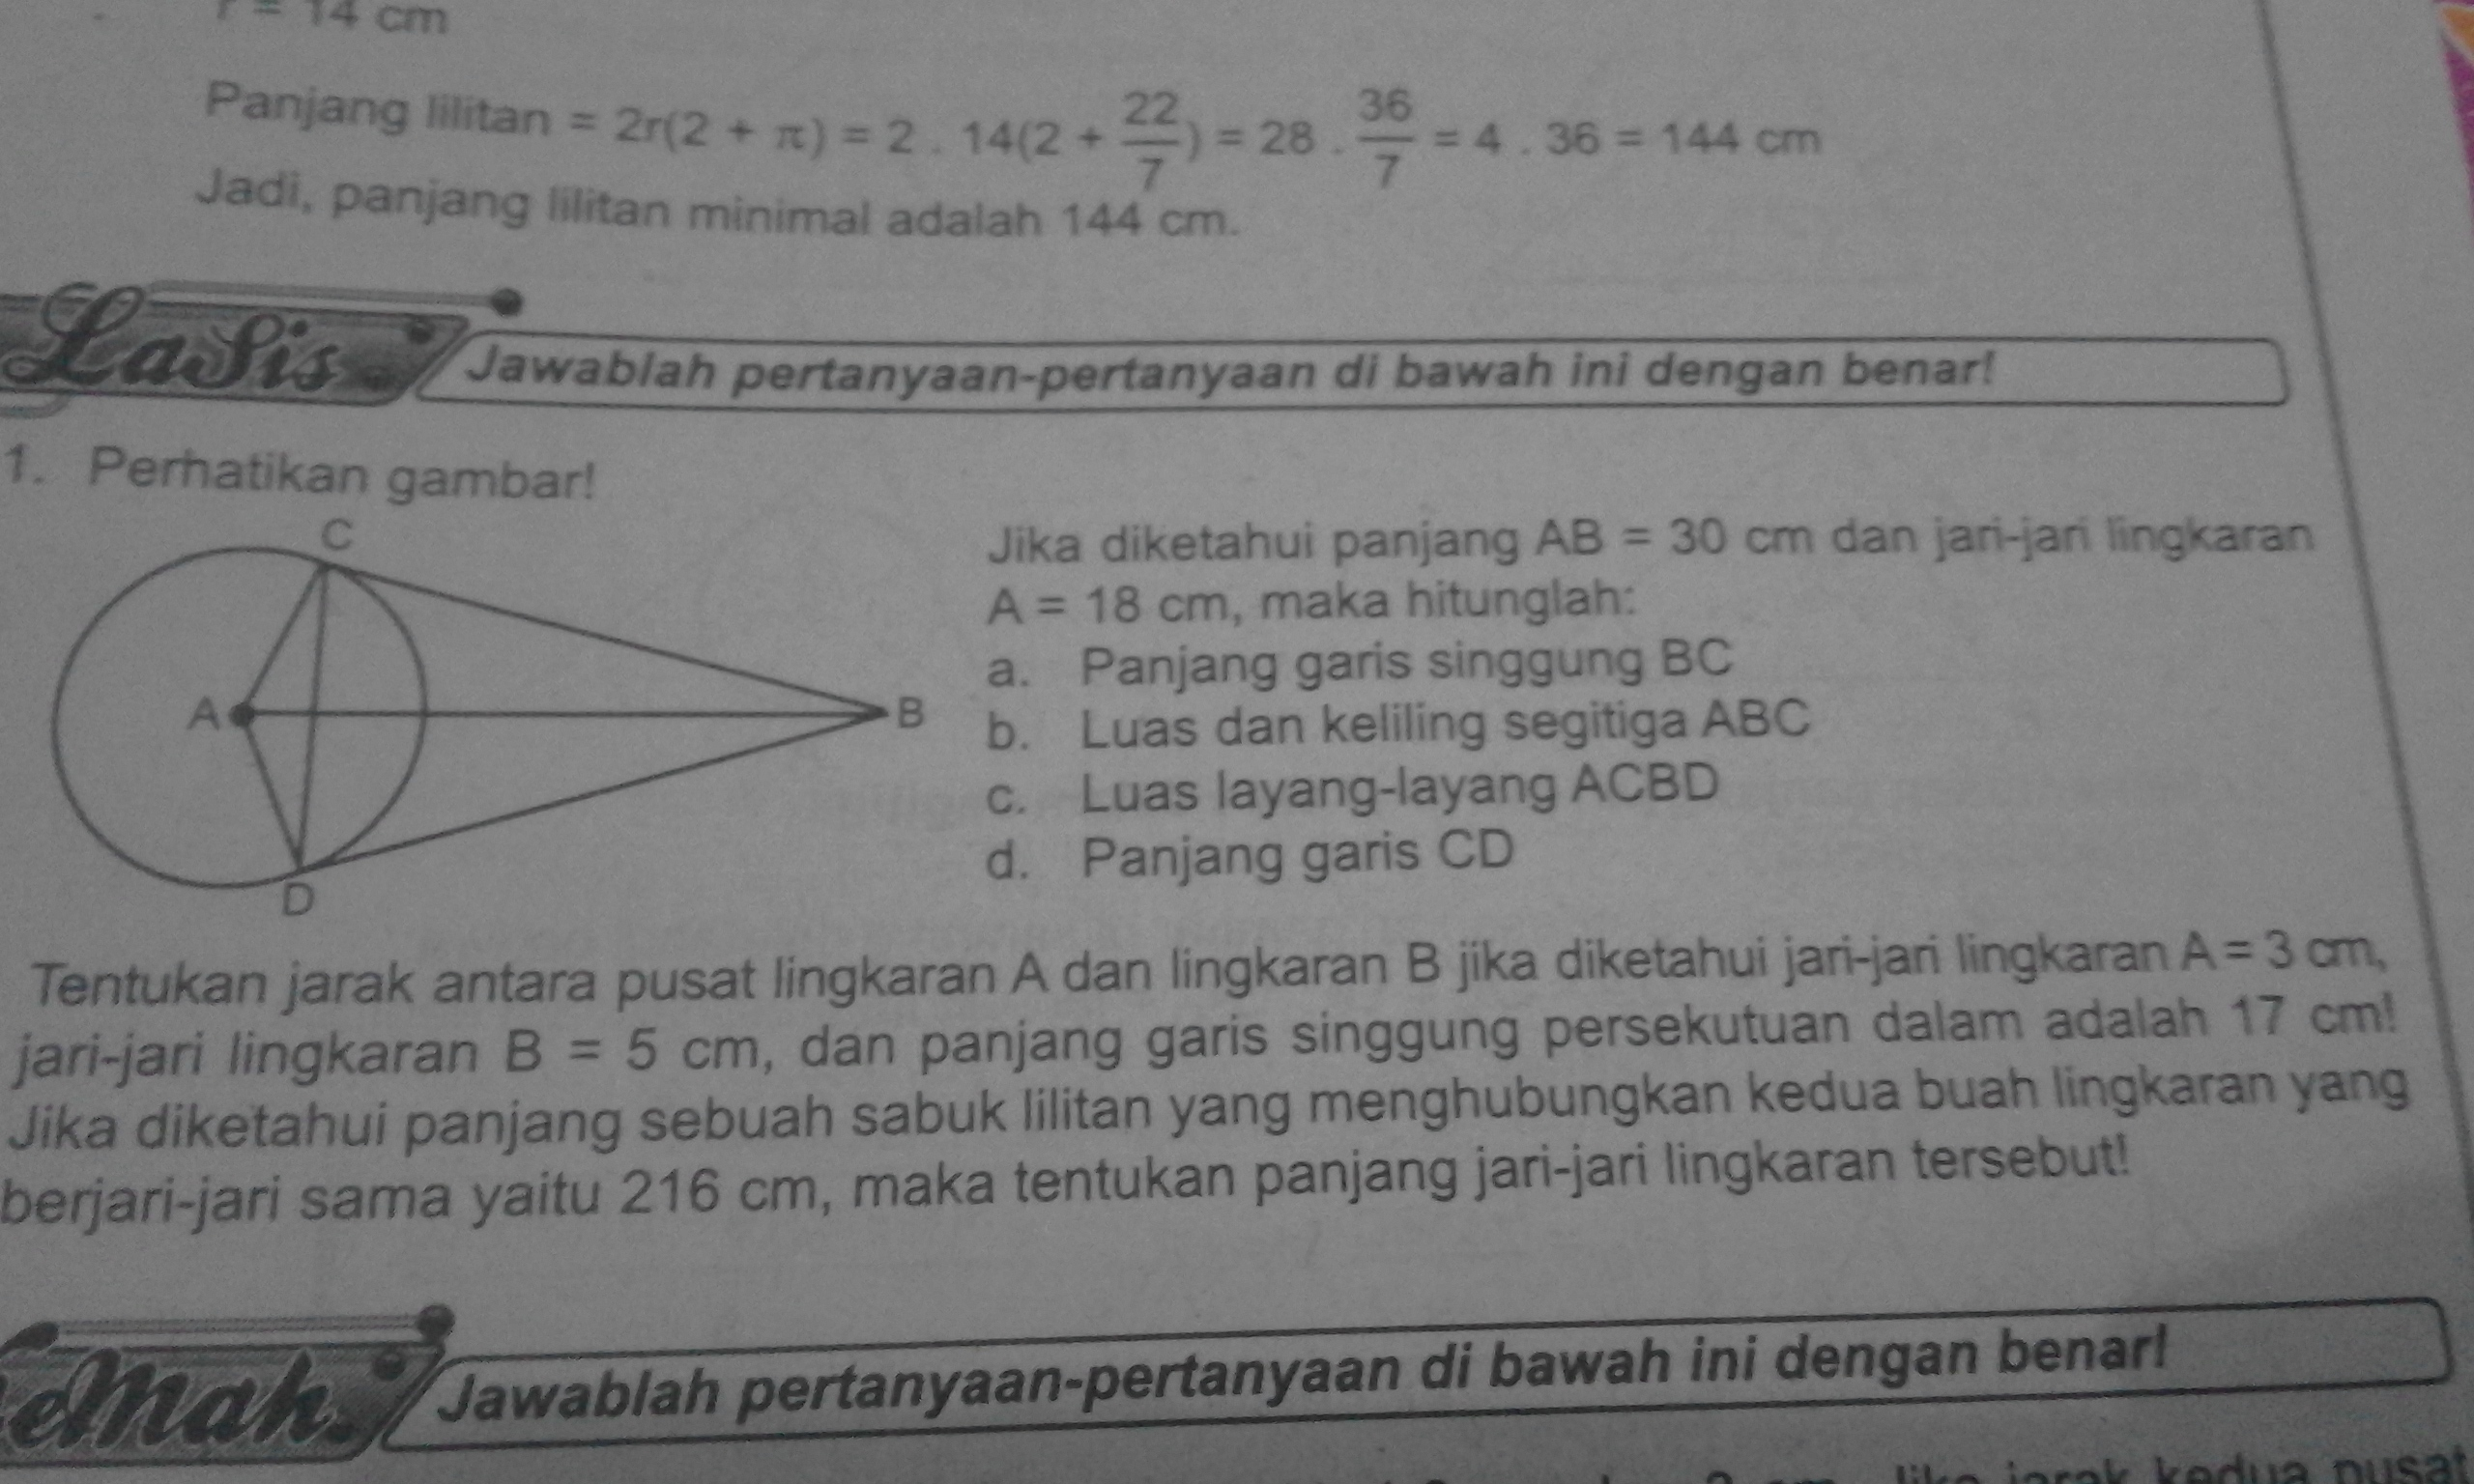 Jika Diketahui panjang AB = 30 cm dan jari jari lingkaran A = 18 cm maka hitunglah a panjang garis singgung BC b Luas dan keliling segitiga ABC